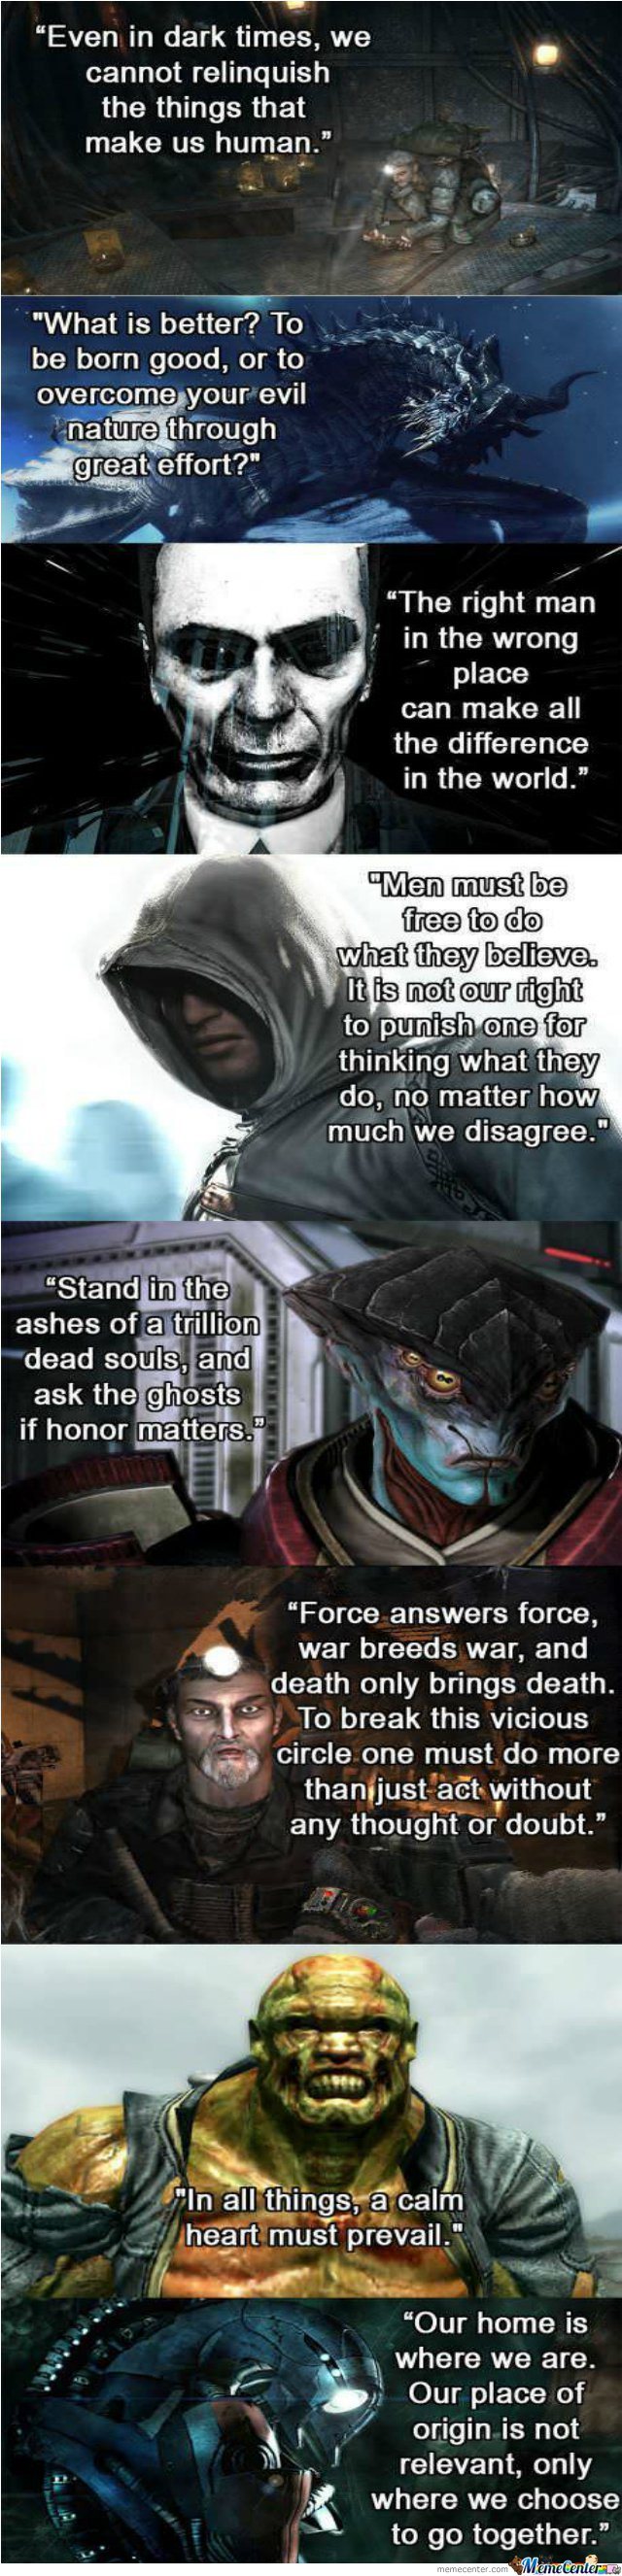 Inspirational video game quotes http//ift.tt/2envL5r